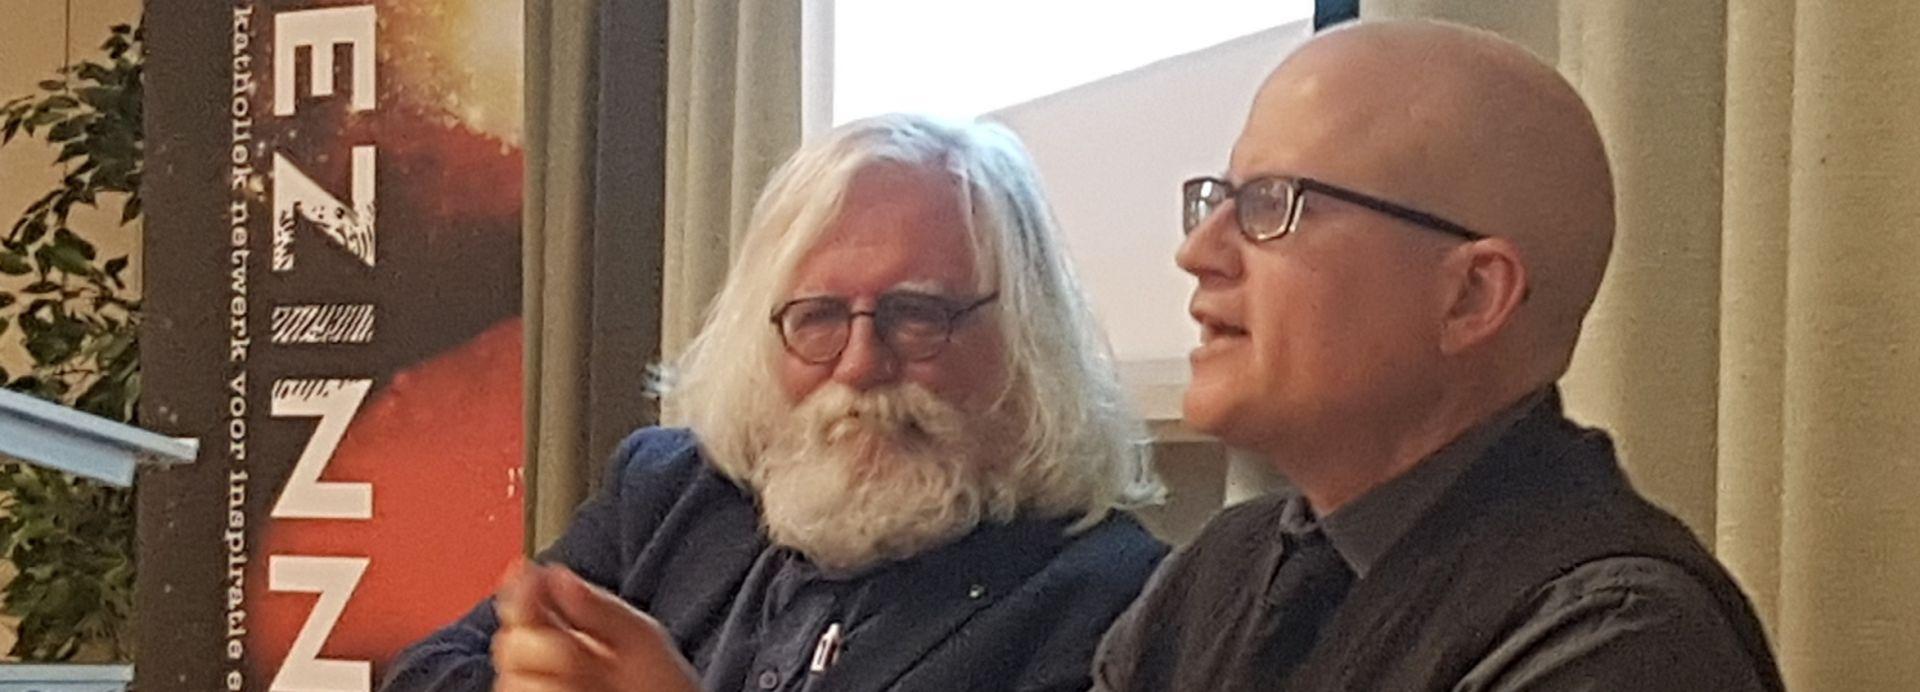 Christian Wiman en Erik Borgman 2019